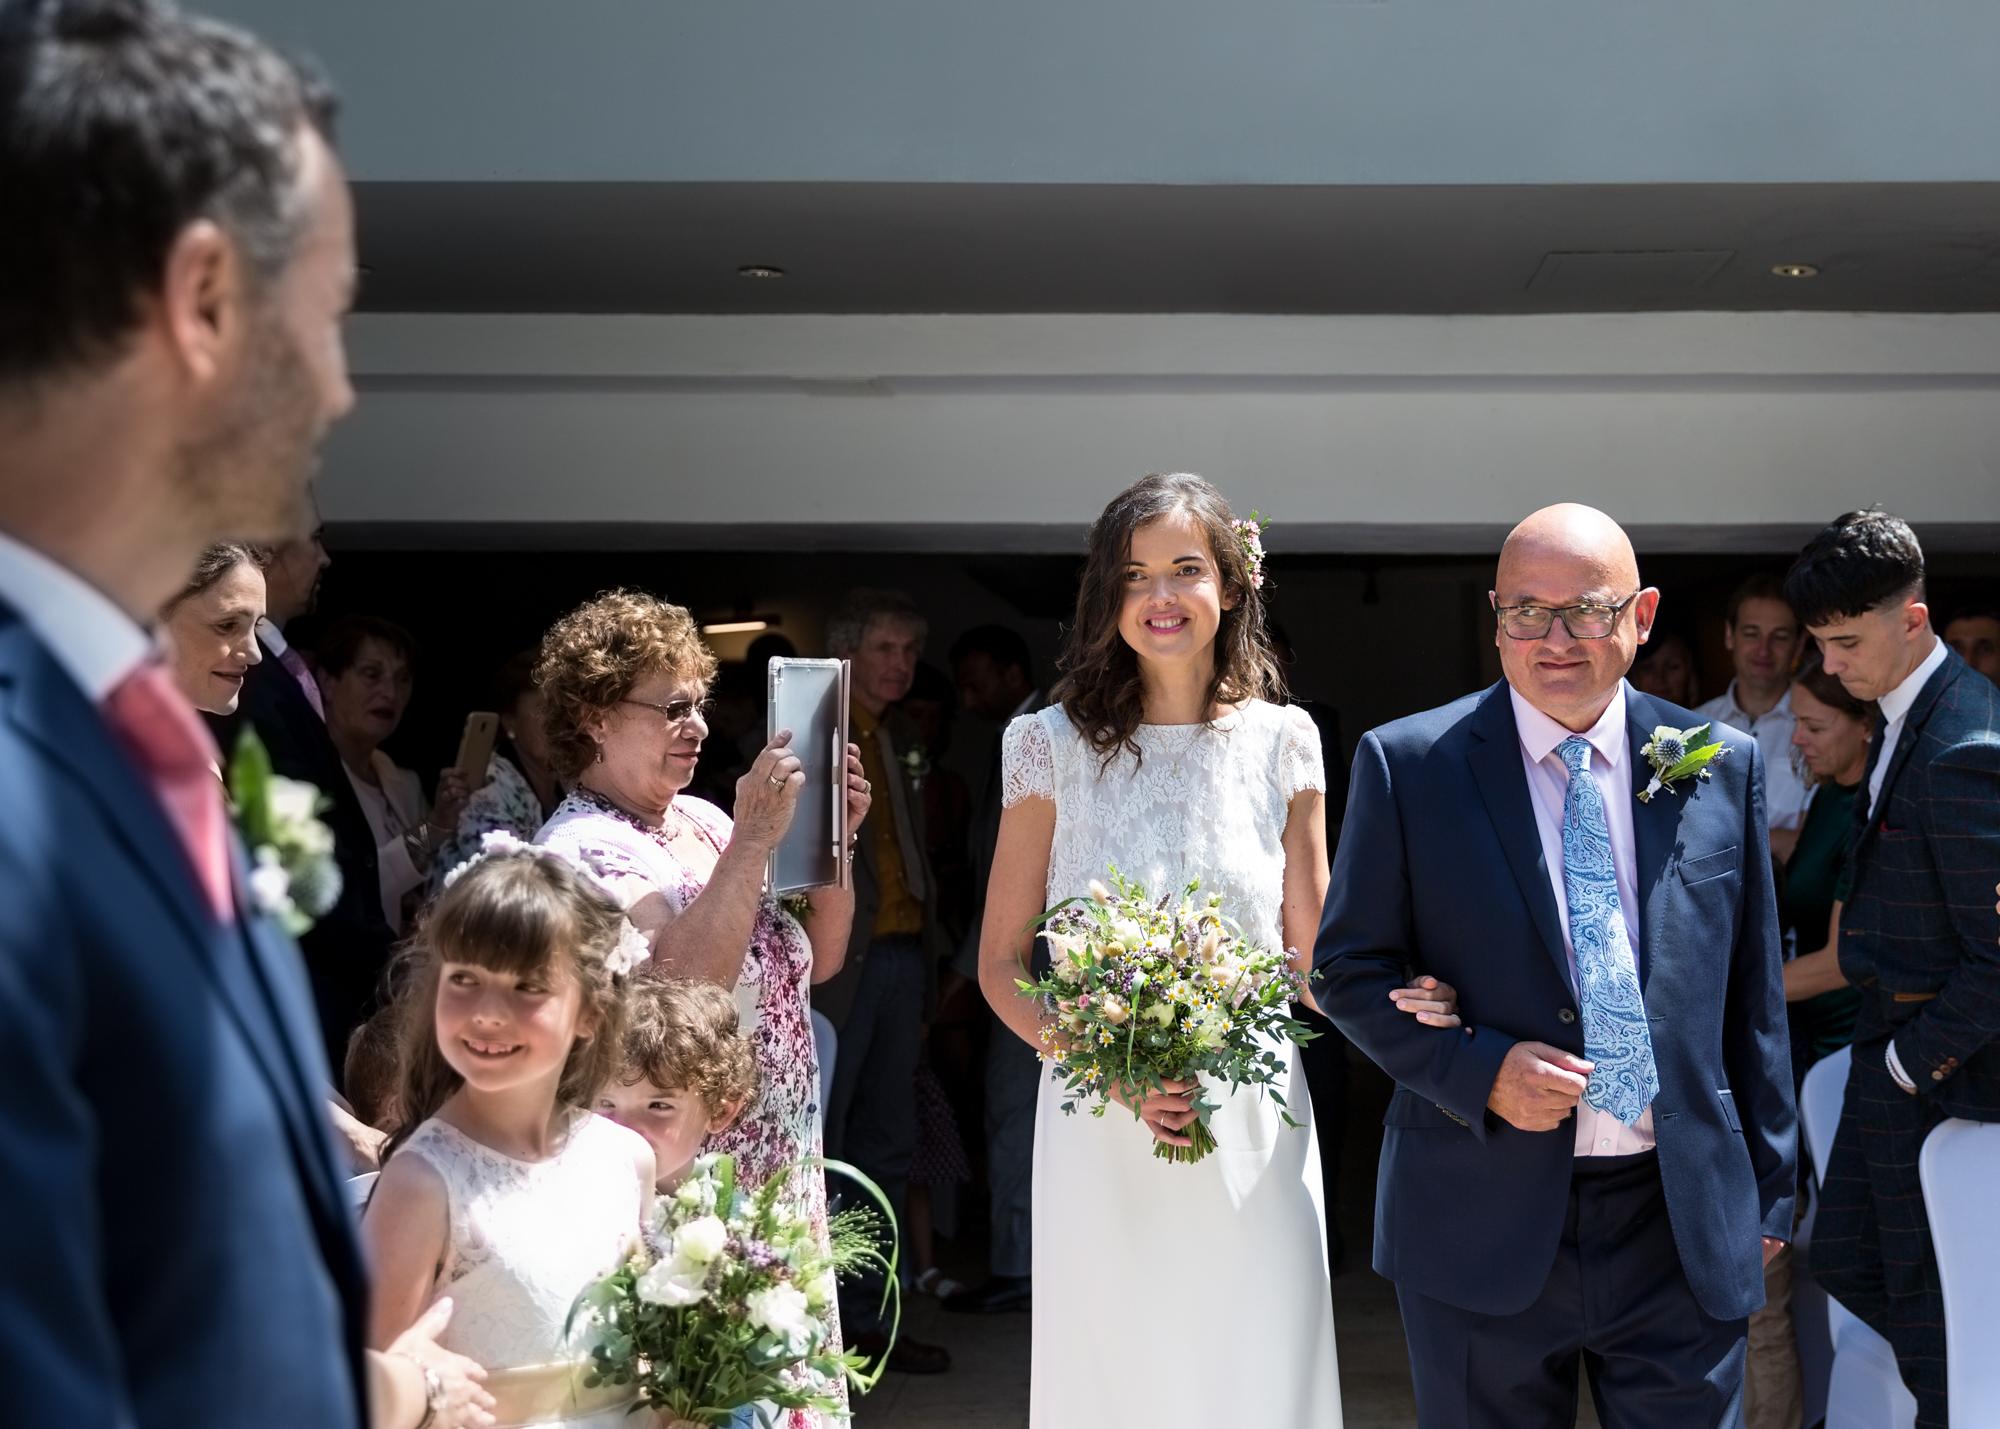 Bride and groom at Llechwen Hall wedding ceremony